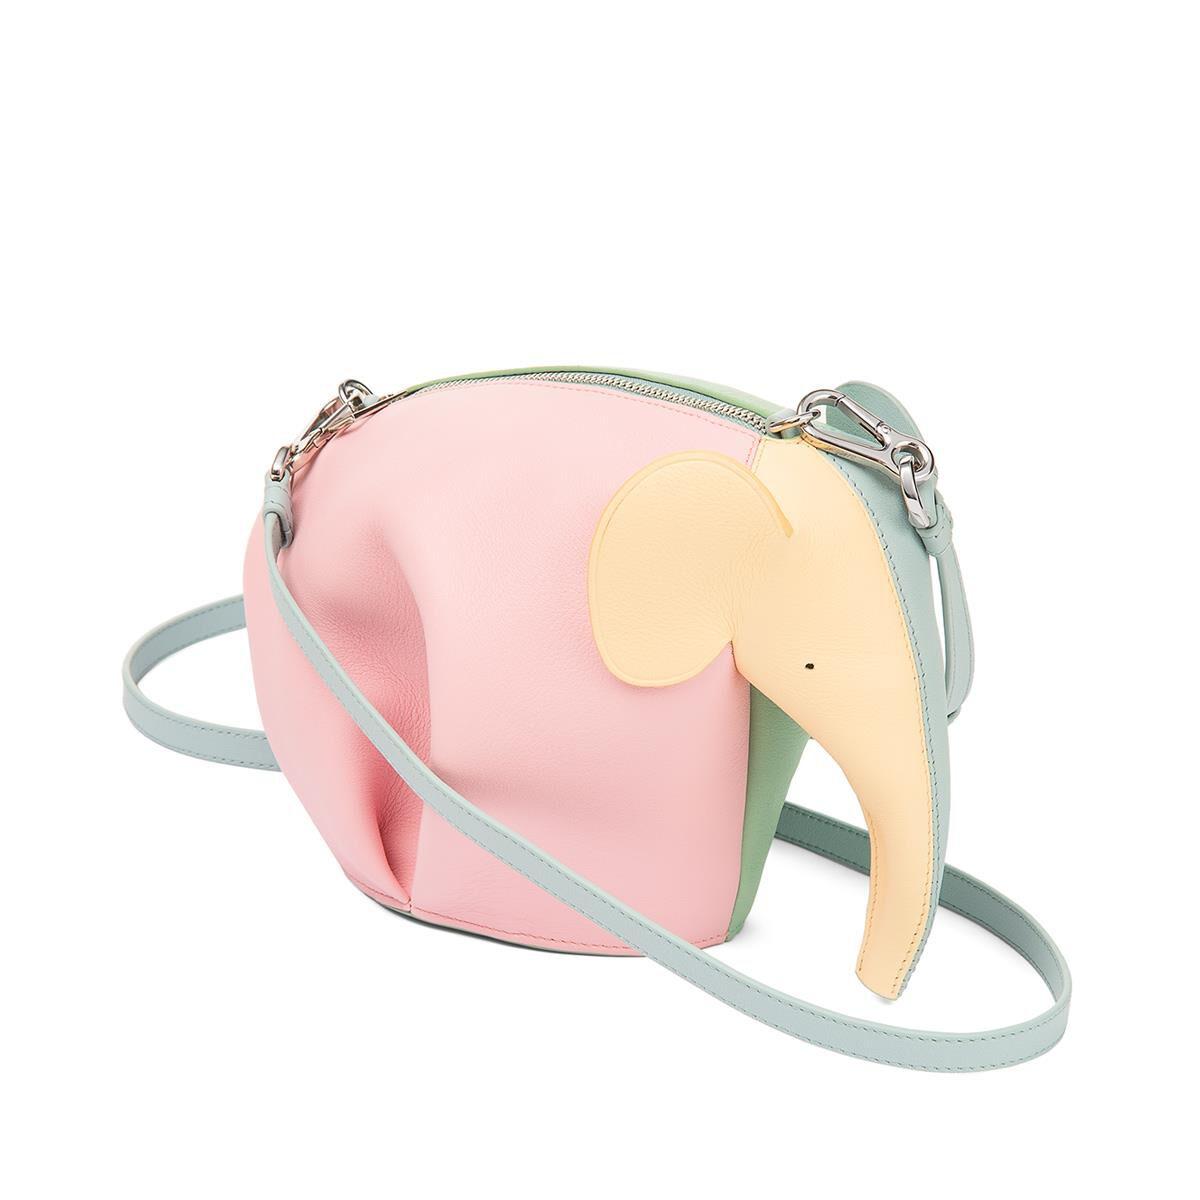 Mini Elephant Bag Loewe 3PqQHO2Ej7